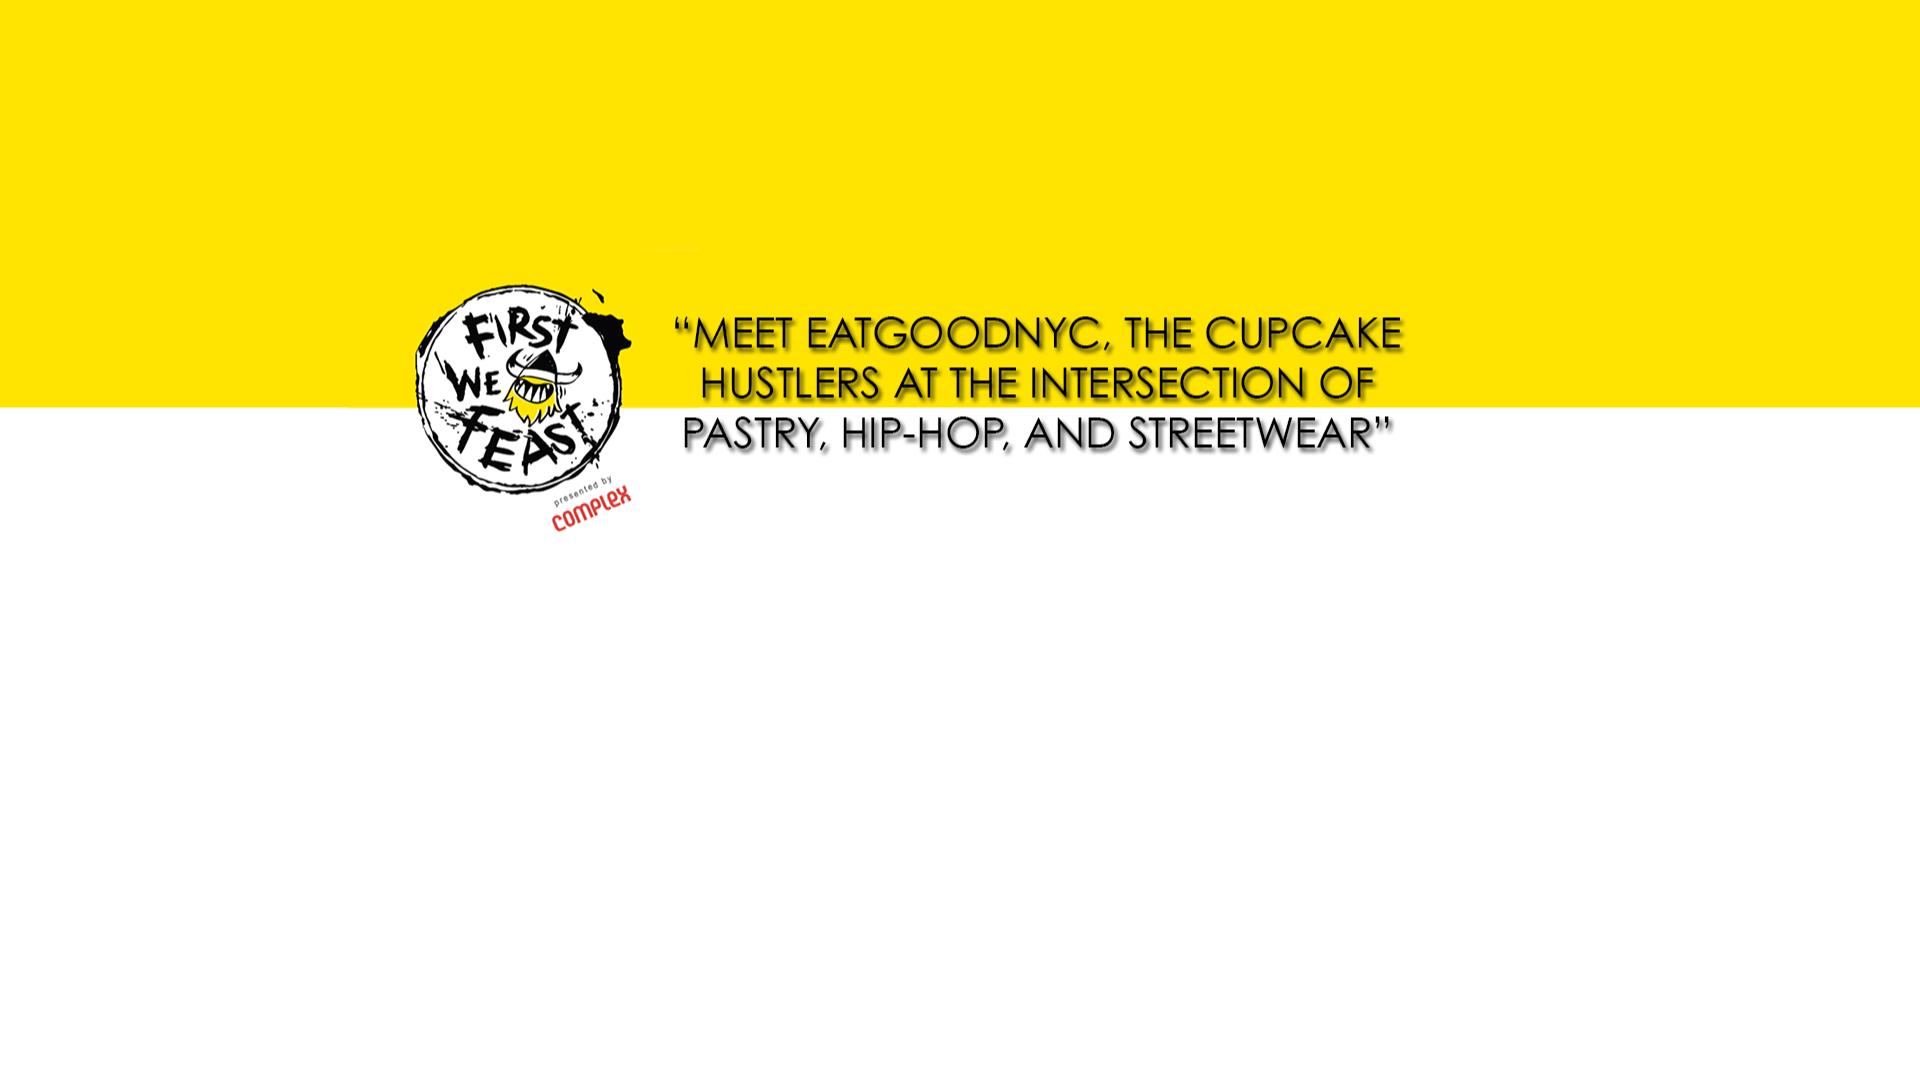 Custom Cupcake and Cookie Bakery - EATGOODNYC